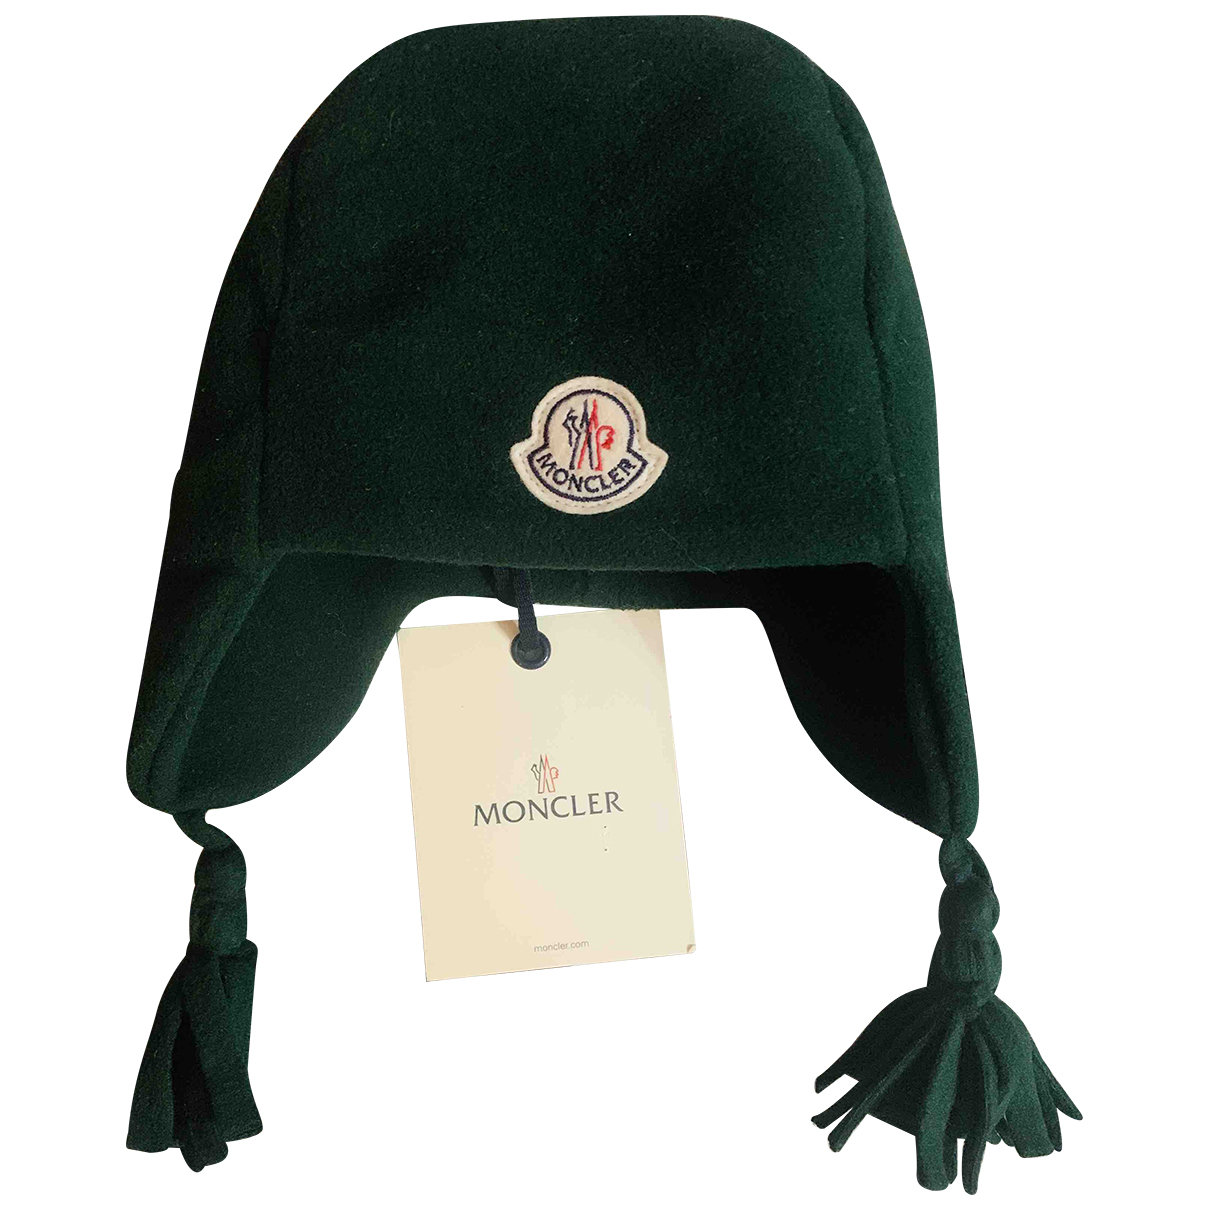 Moncler \N Hut, Muetzen, Handschuhe in  Gruen Synthetik